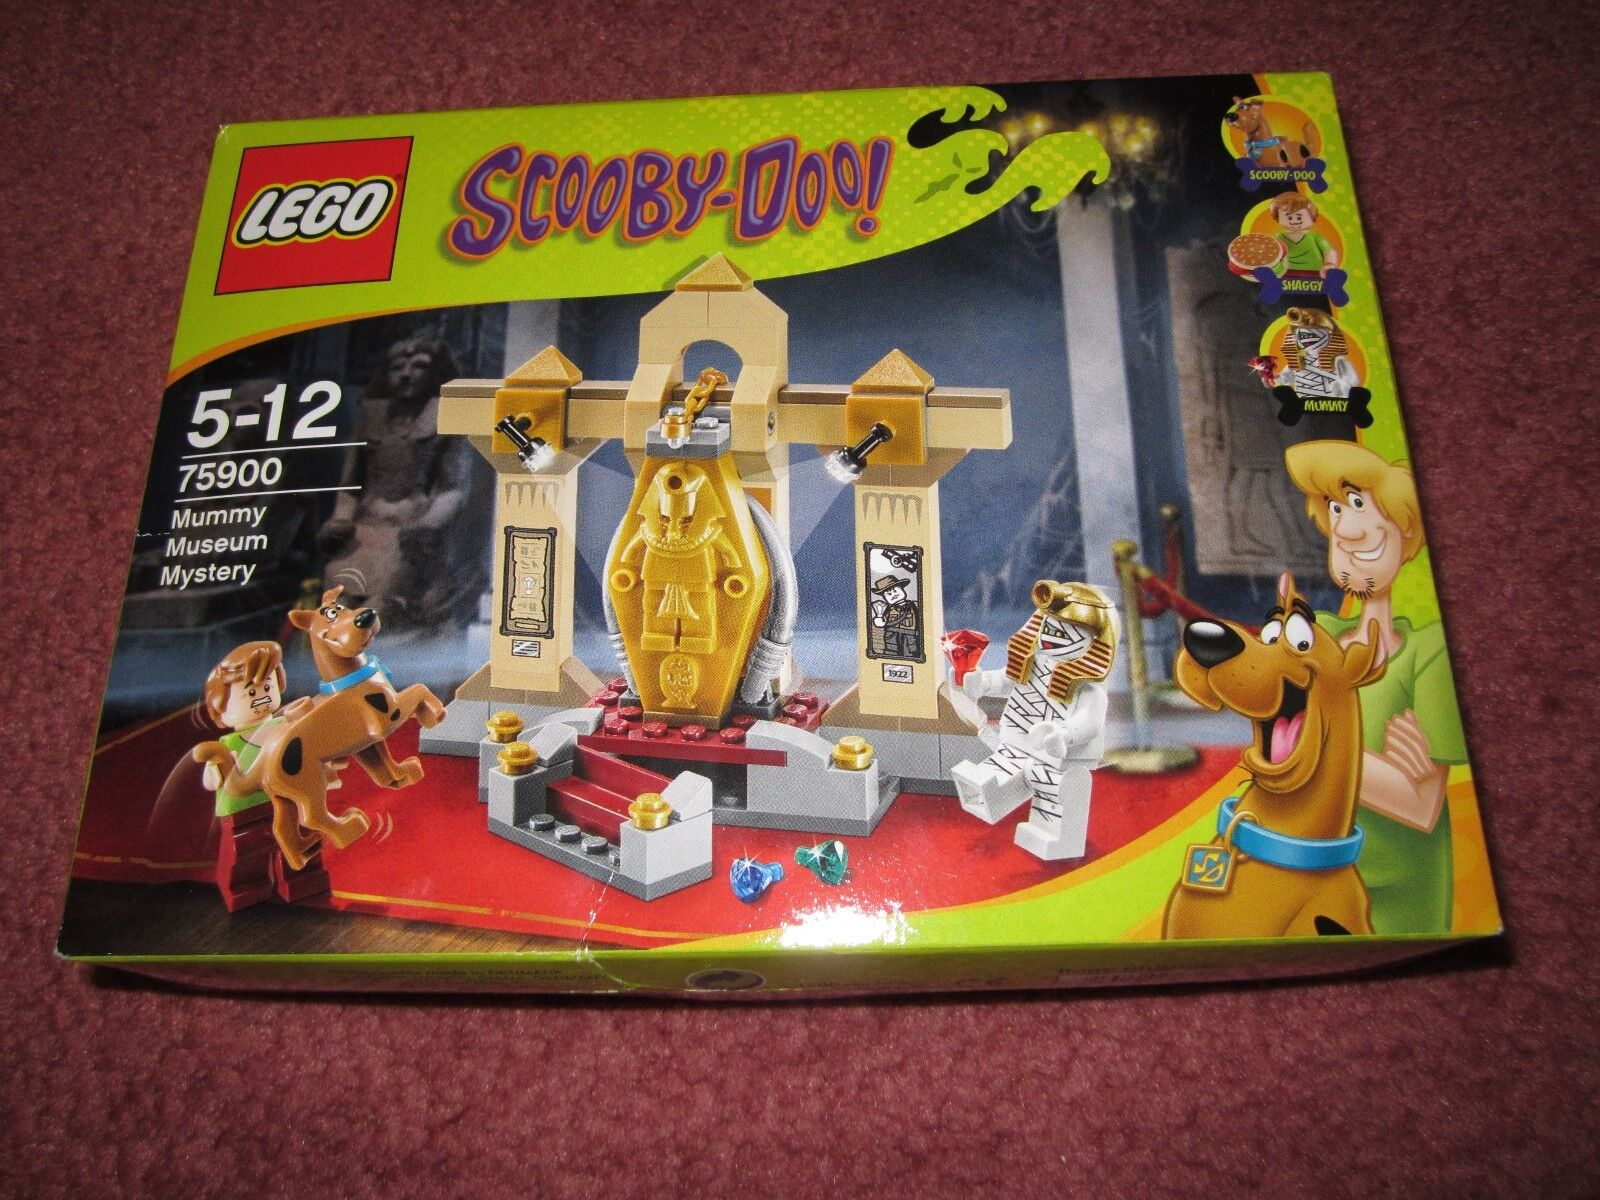 LEGO SCOOBY-DOO MUMMY MUSEUM MYSTERY 75900 DAMAGED BOX - SEE PHOTOS - NEW